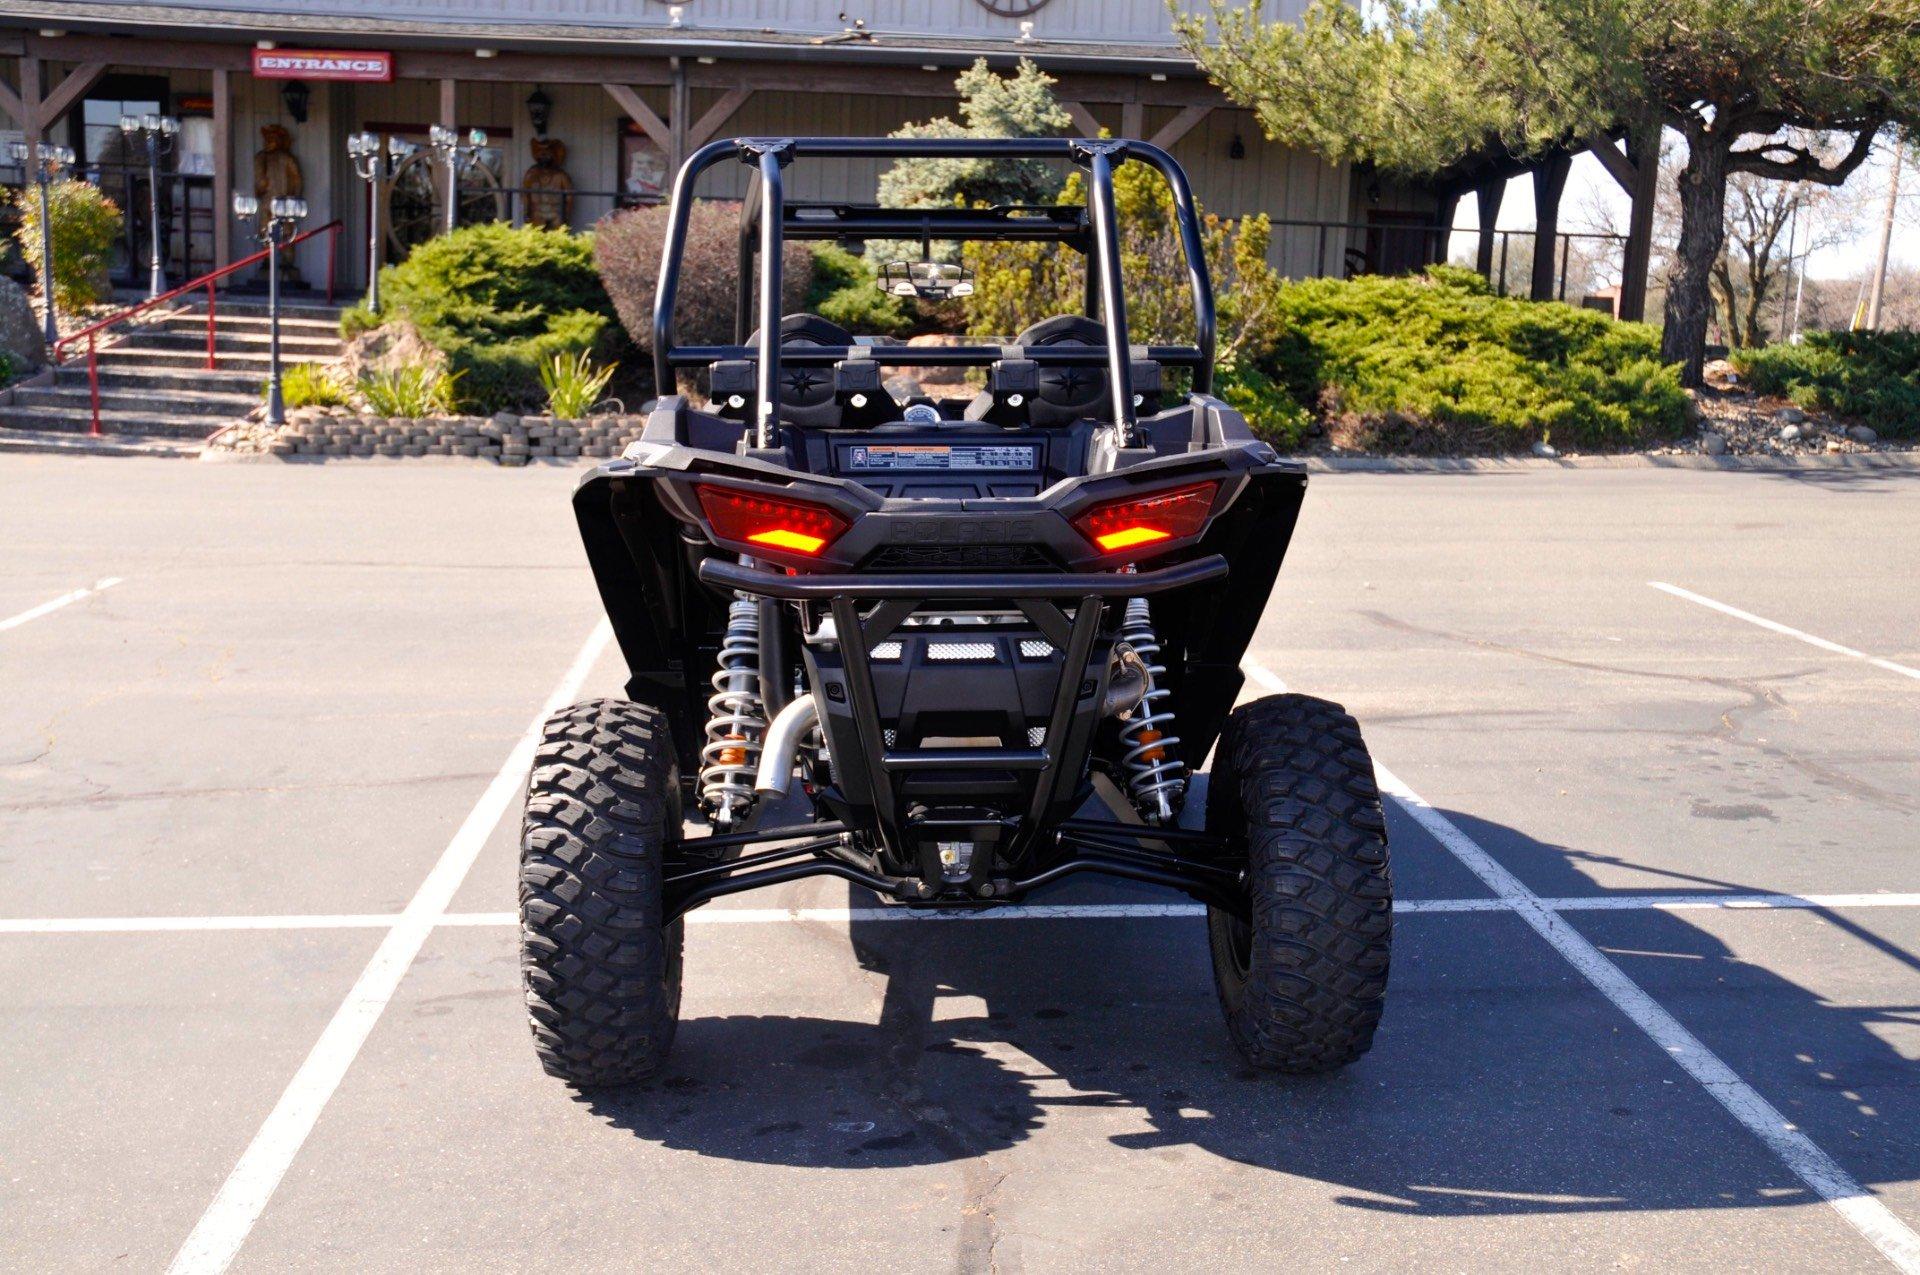 2017 Polaris RZR XP 1000 EPS LE in Roseville, California